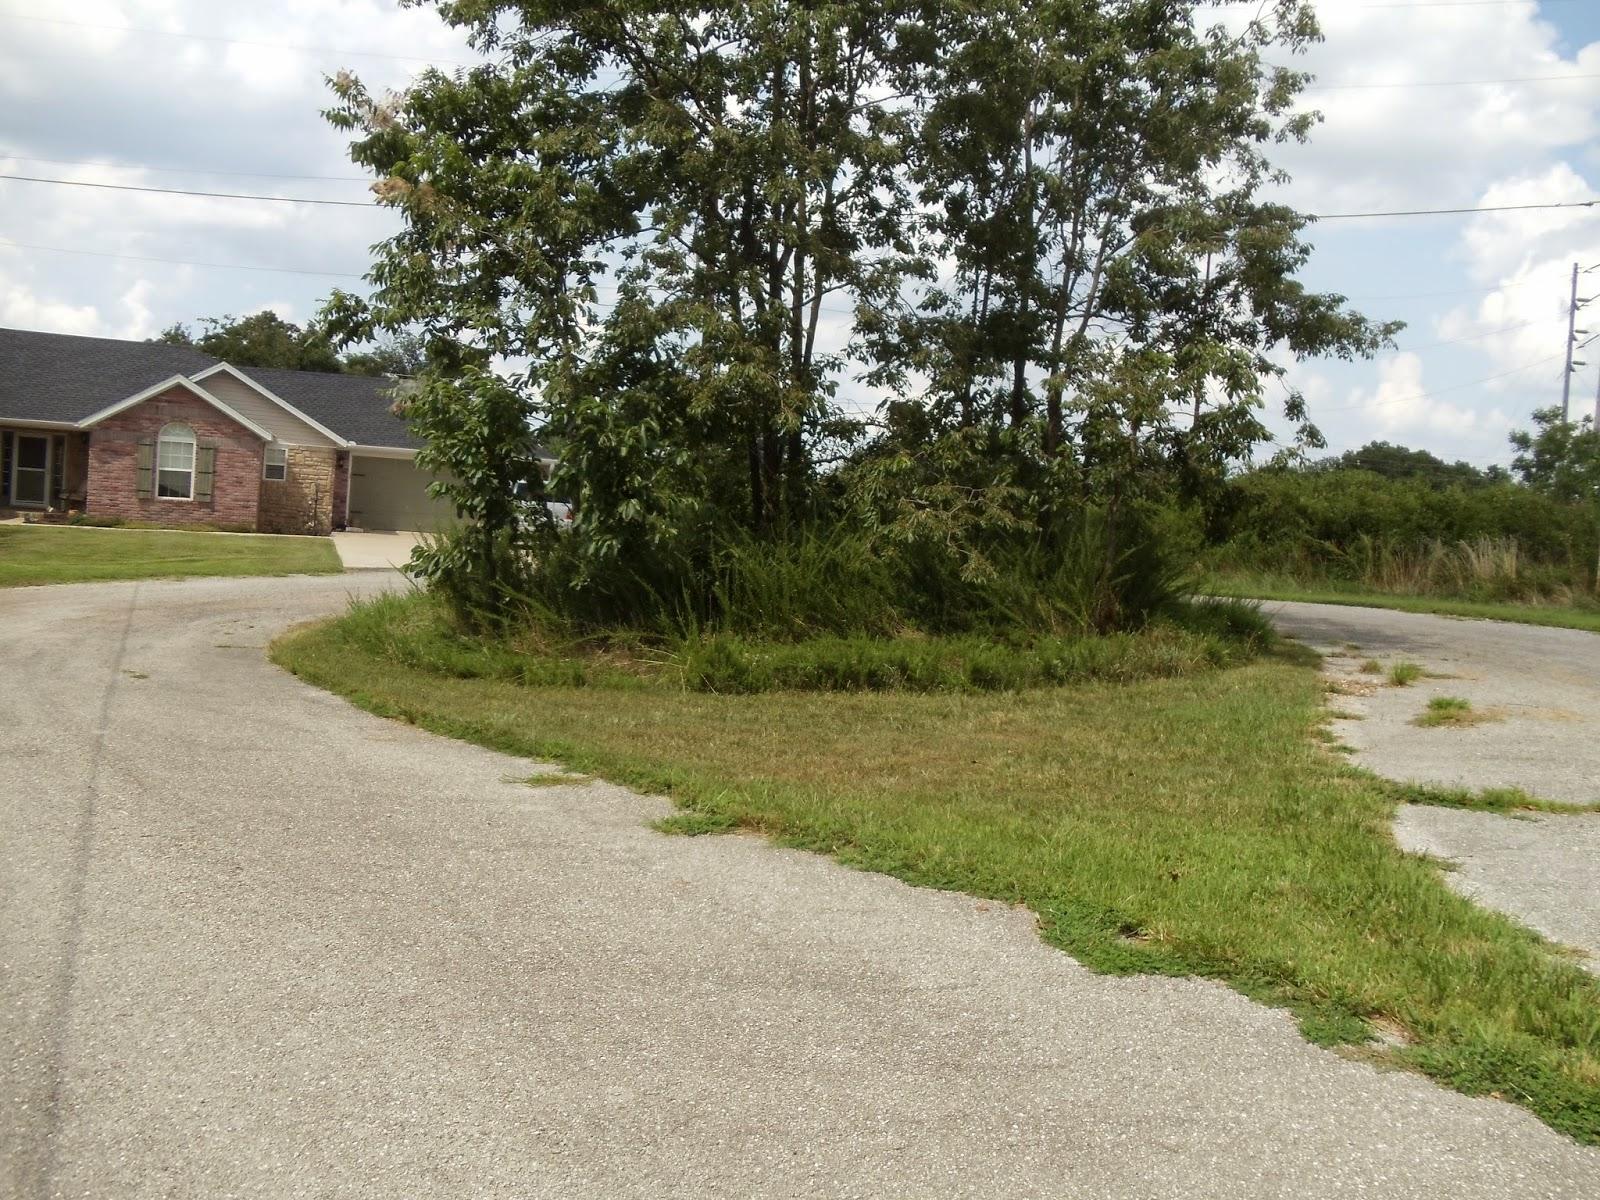 Bella Vista home Lots & land Mike Carey 479 644 4109